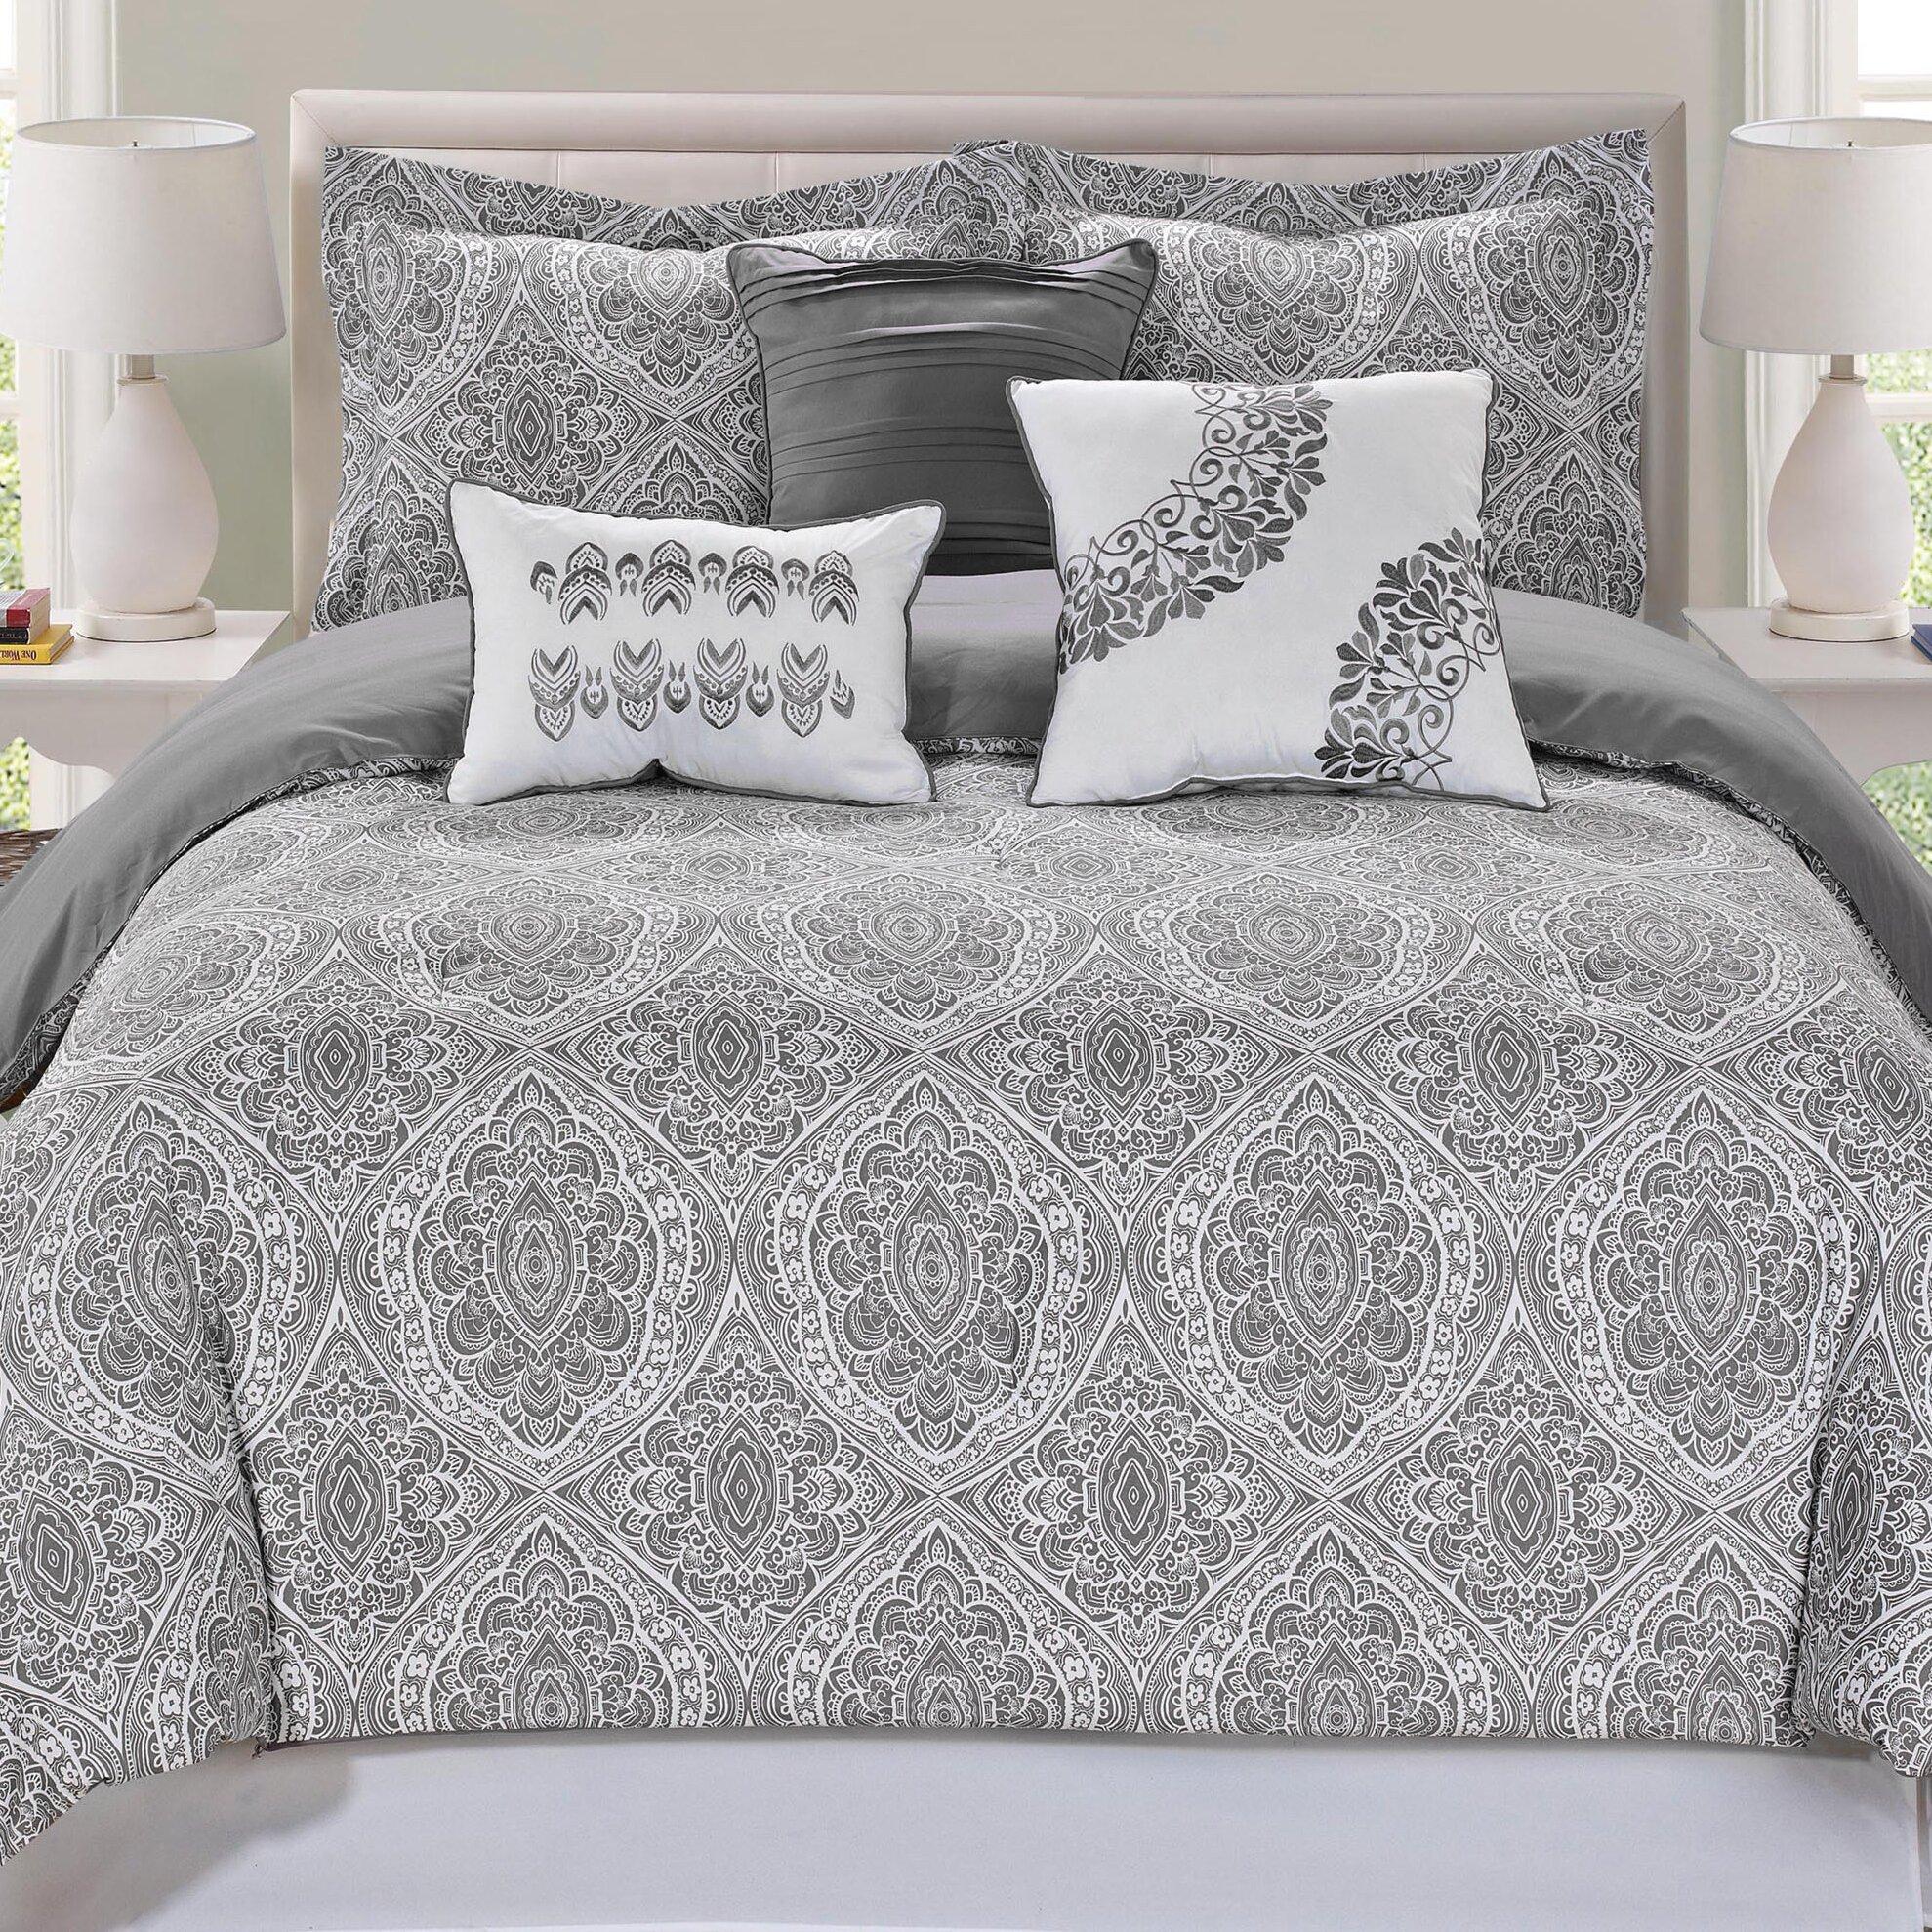 Alcott Hill Varian Upholstered Storage Bedroom Bench: Varian 7 Piece Comforter Set